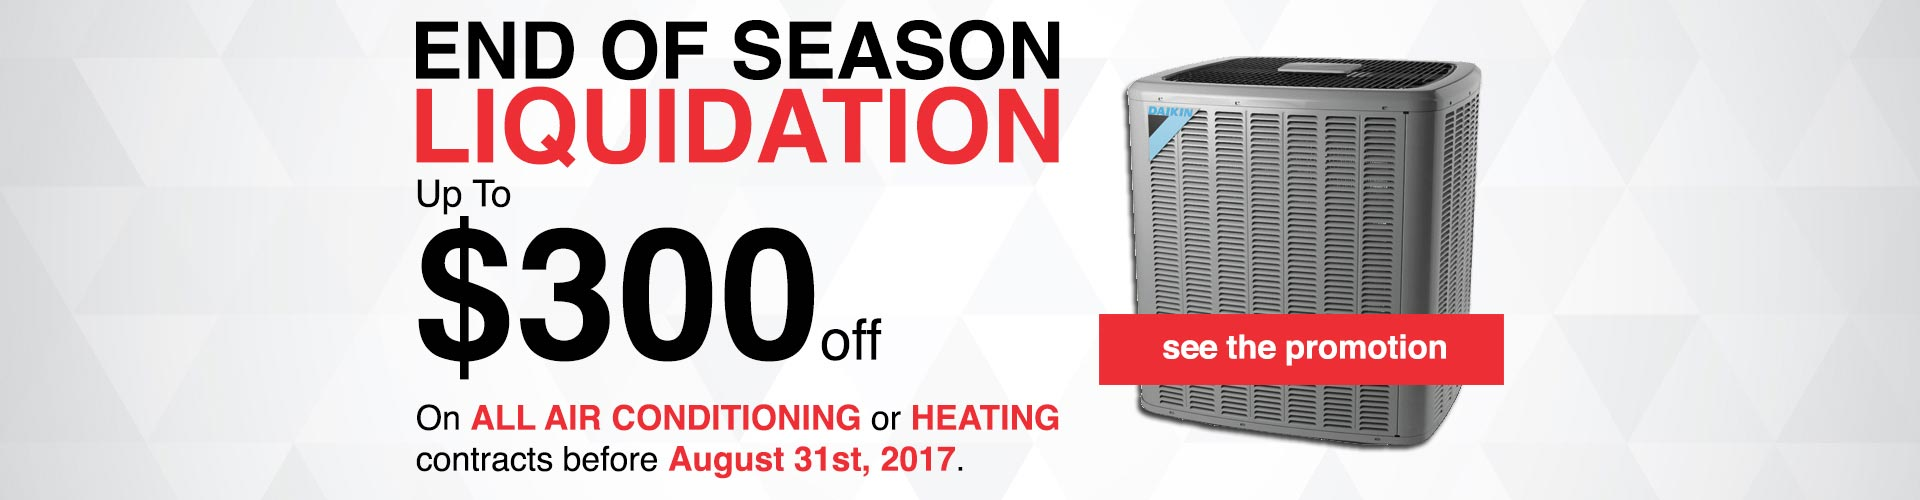 J.M. Air Montreal Heating Pump Air Conditioning